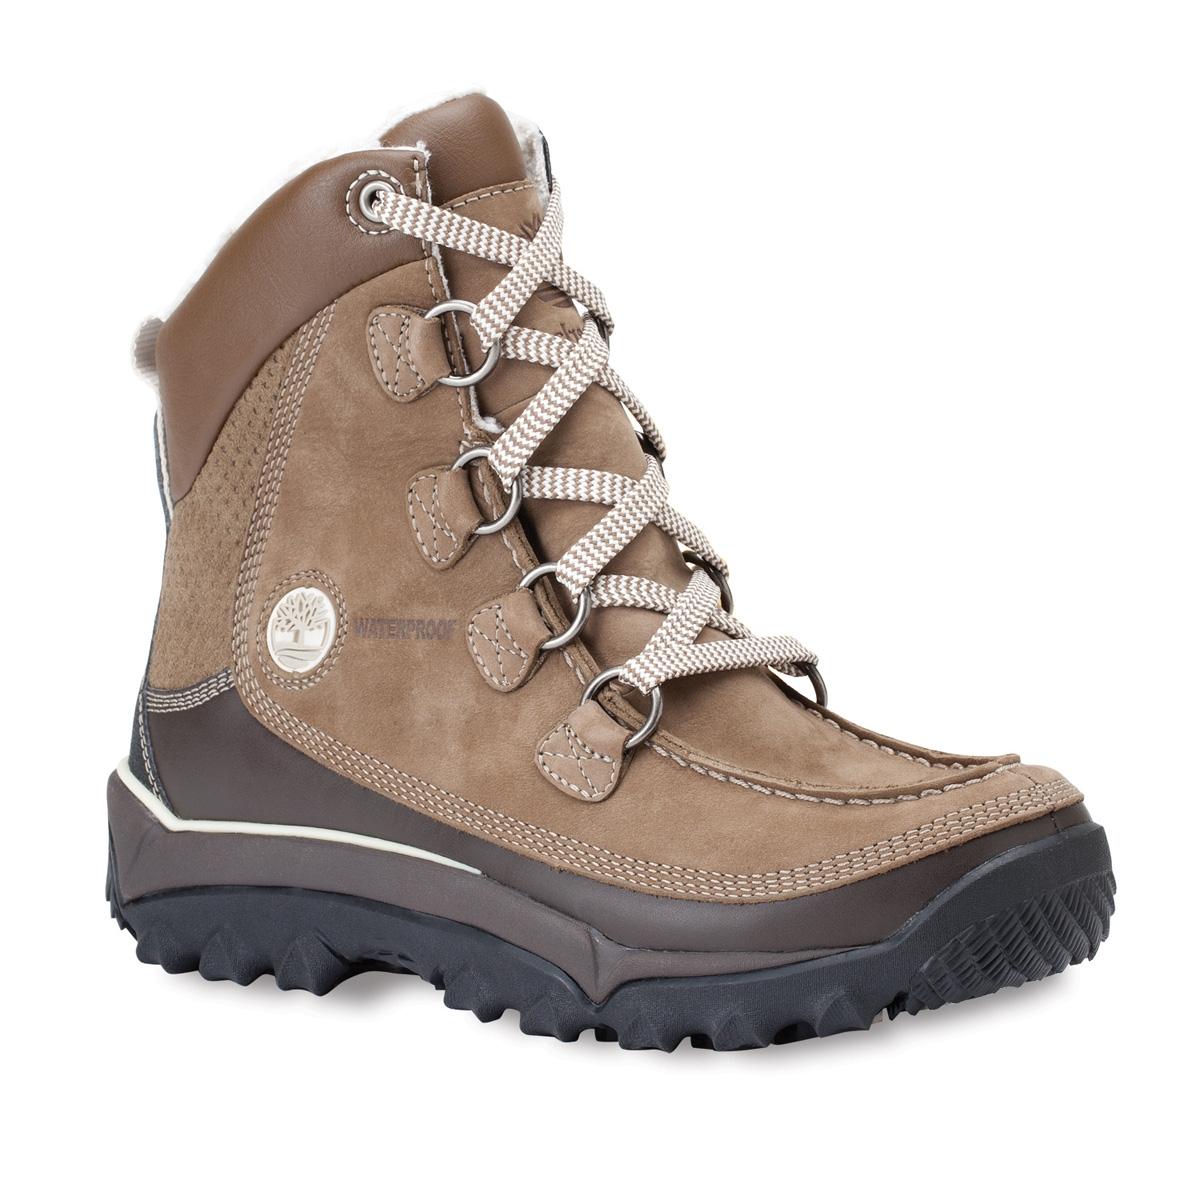 Image of Timberland Rime Ridge HP WP Premium Walking Boot (Women's) Taupe